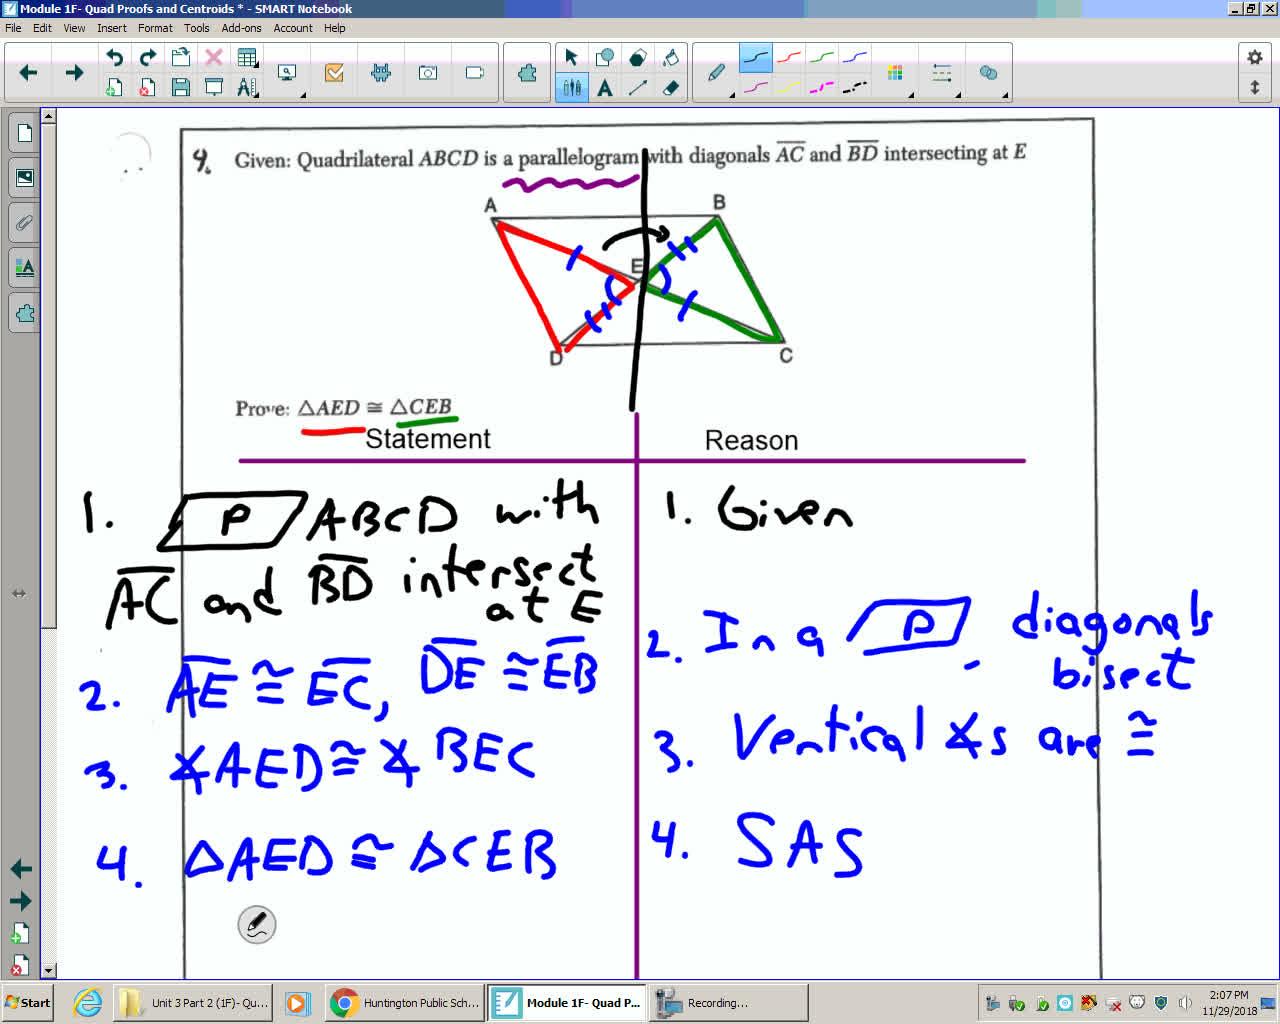 Mod 1F Unit 3B Lesson 4